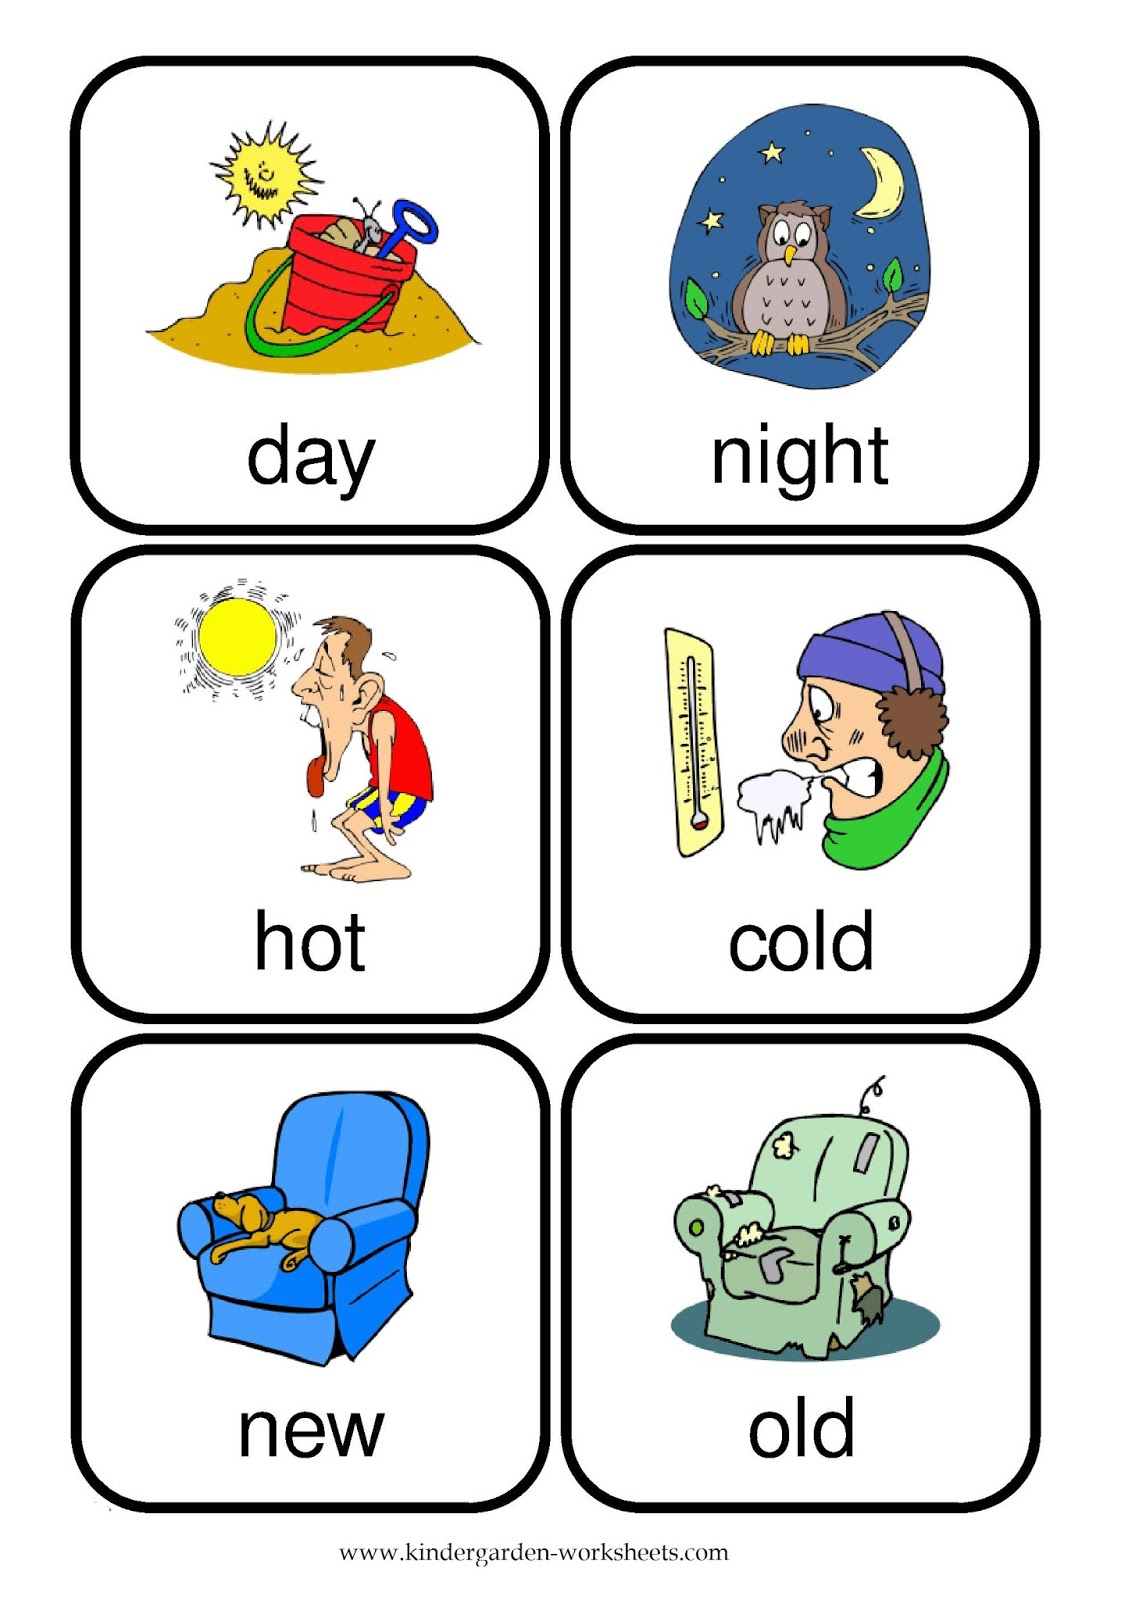 Kinder Garden: Kindergarten Worksheets: Flashcards